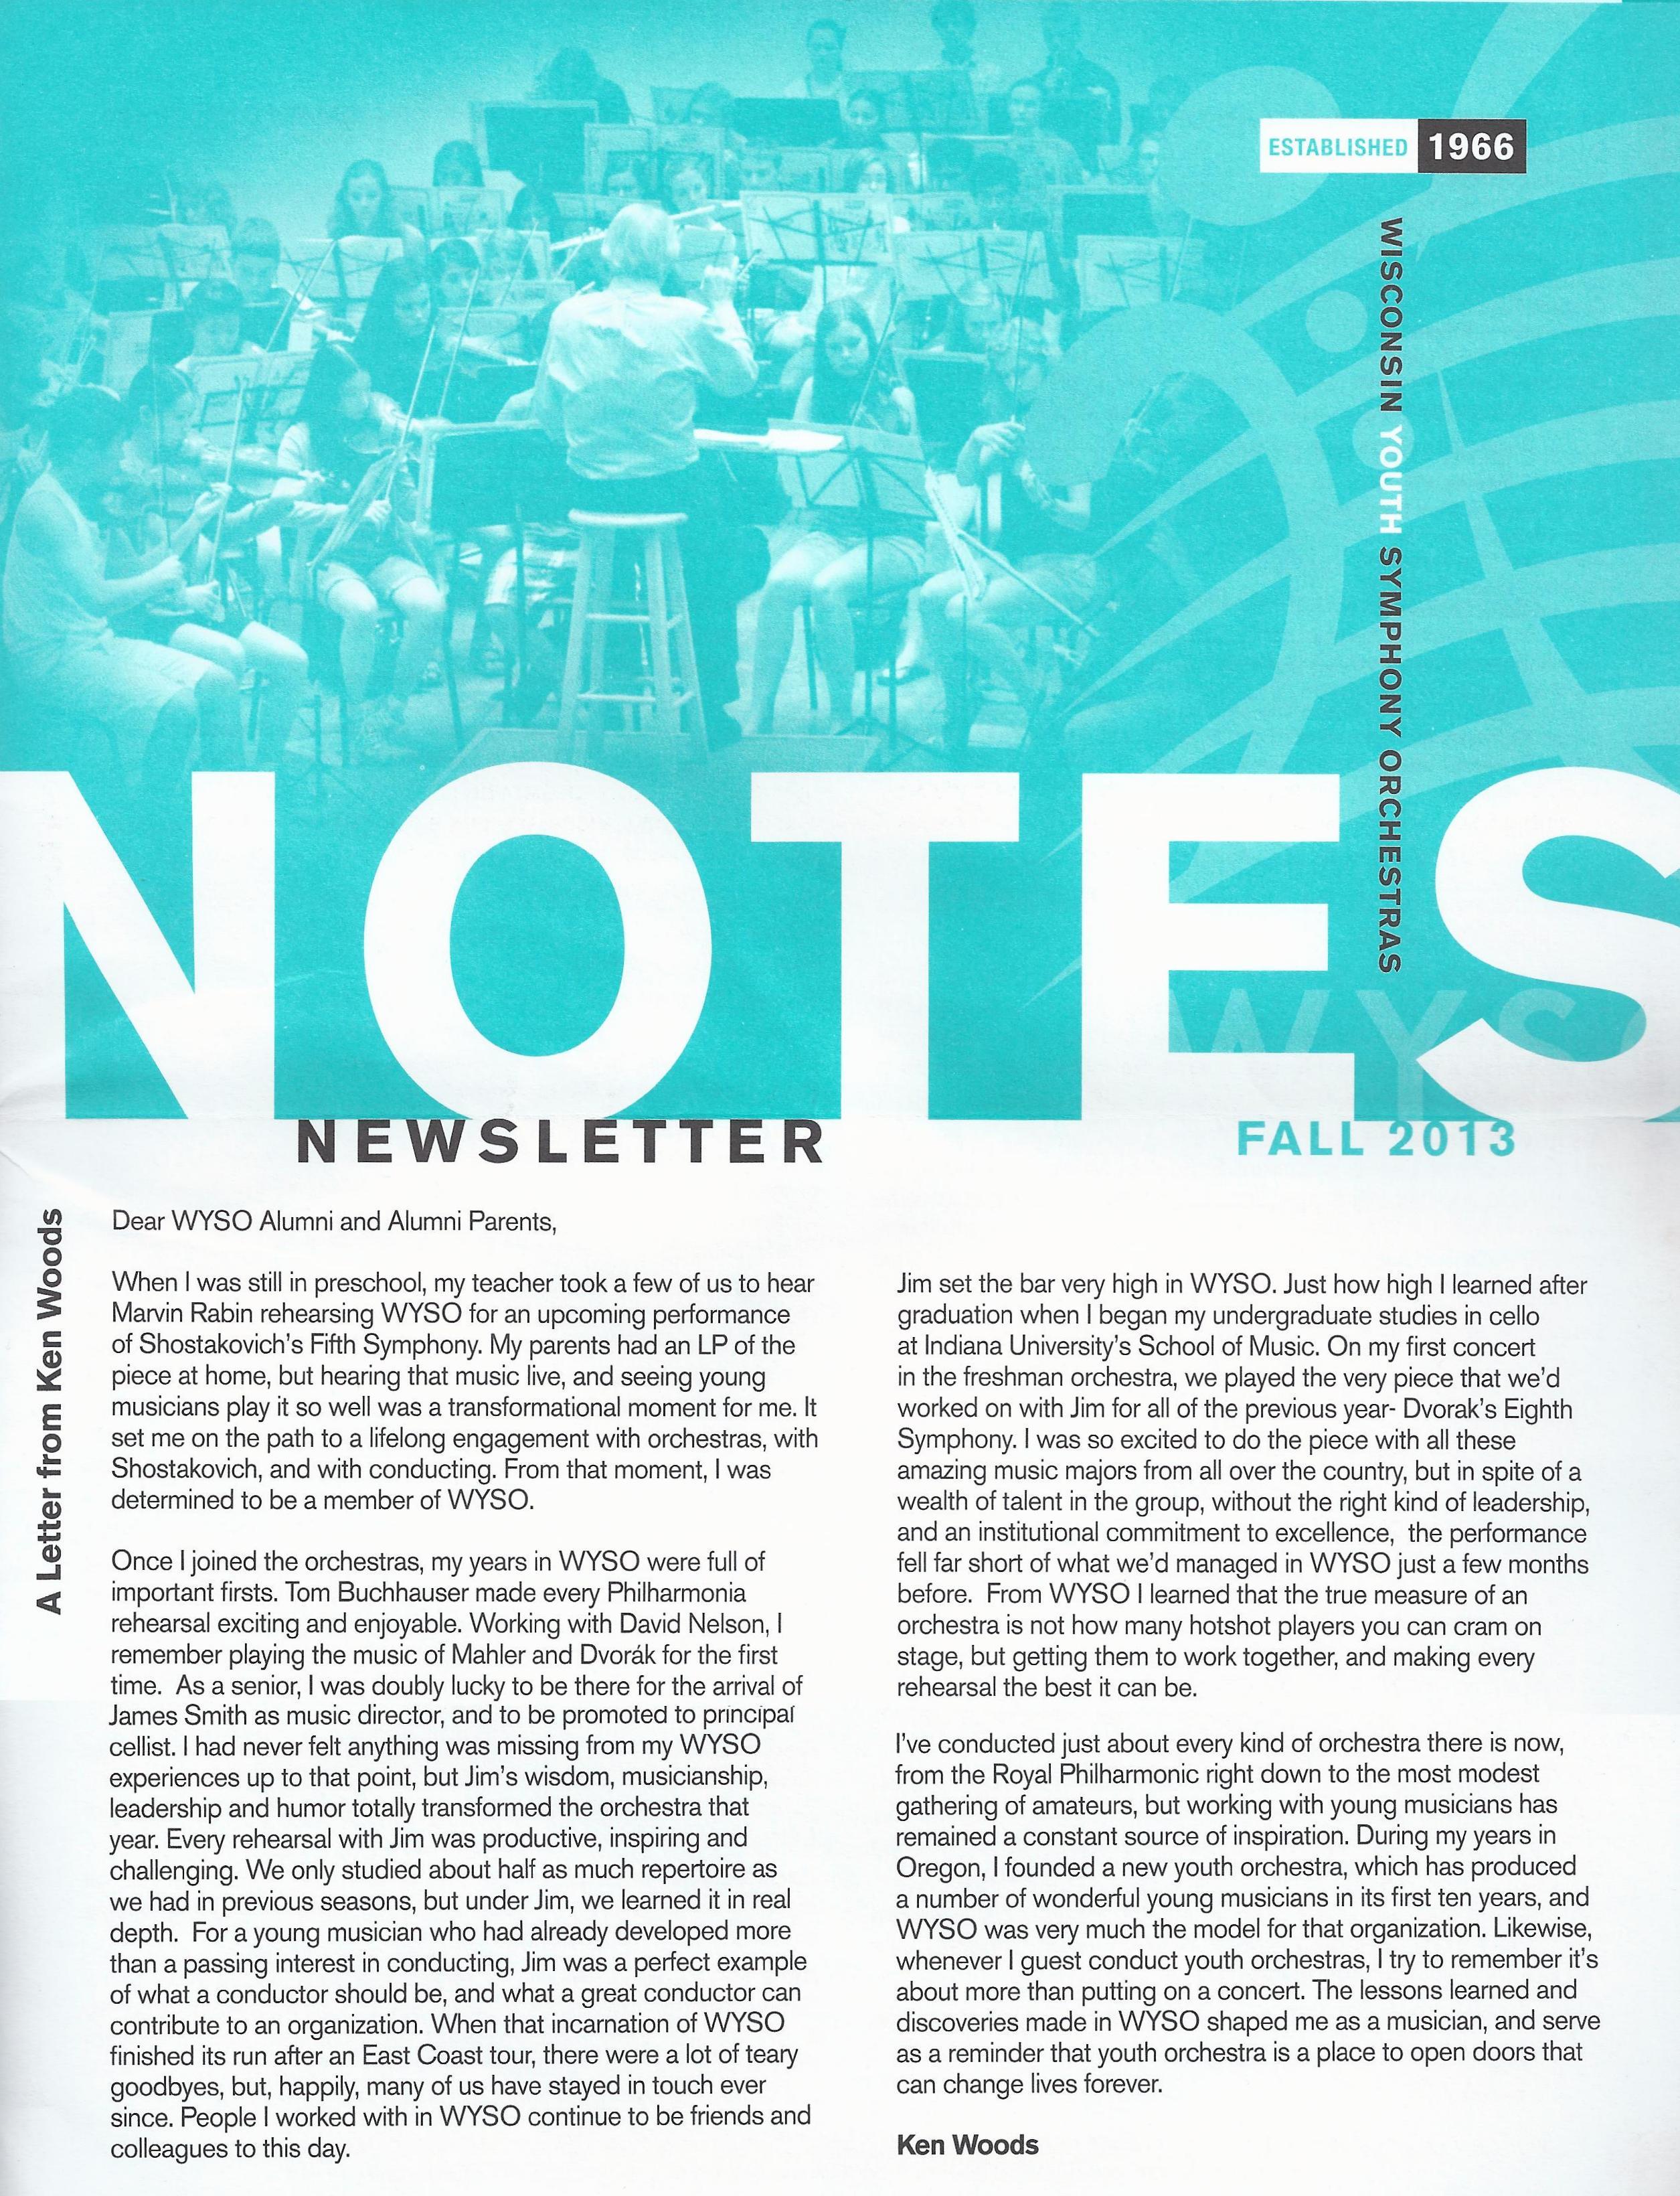 WYSO Newsletter